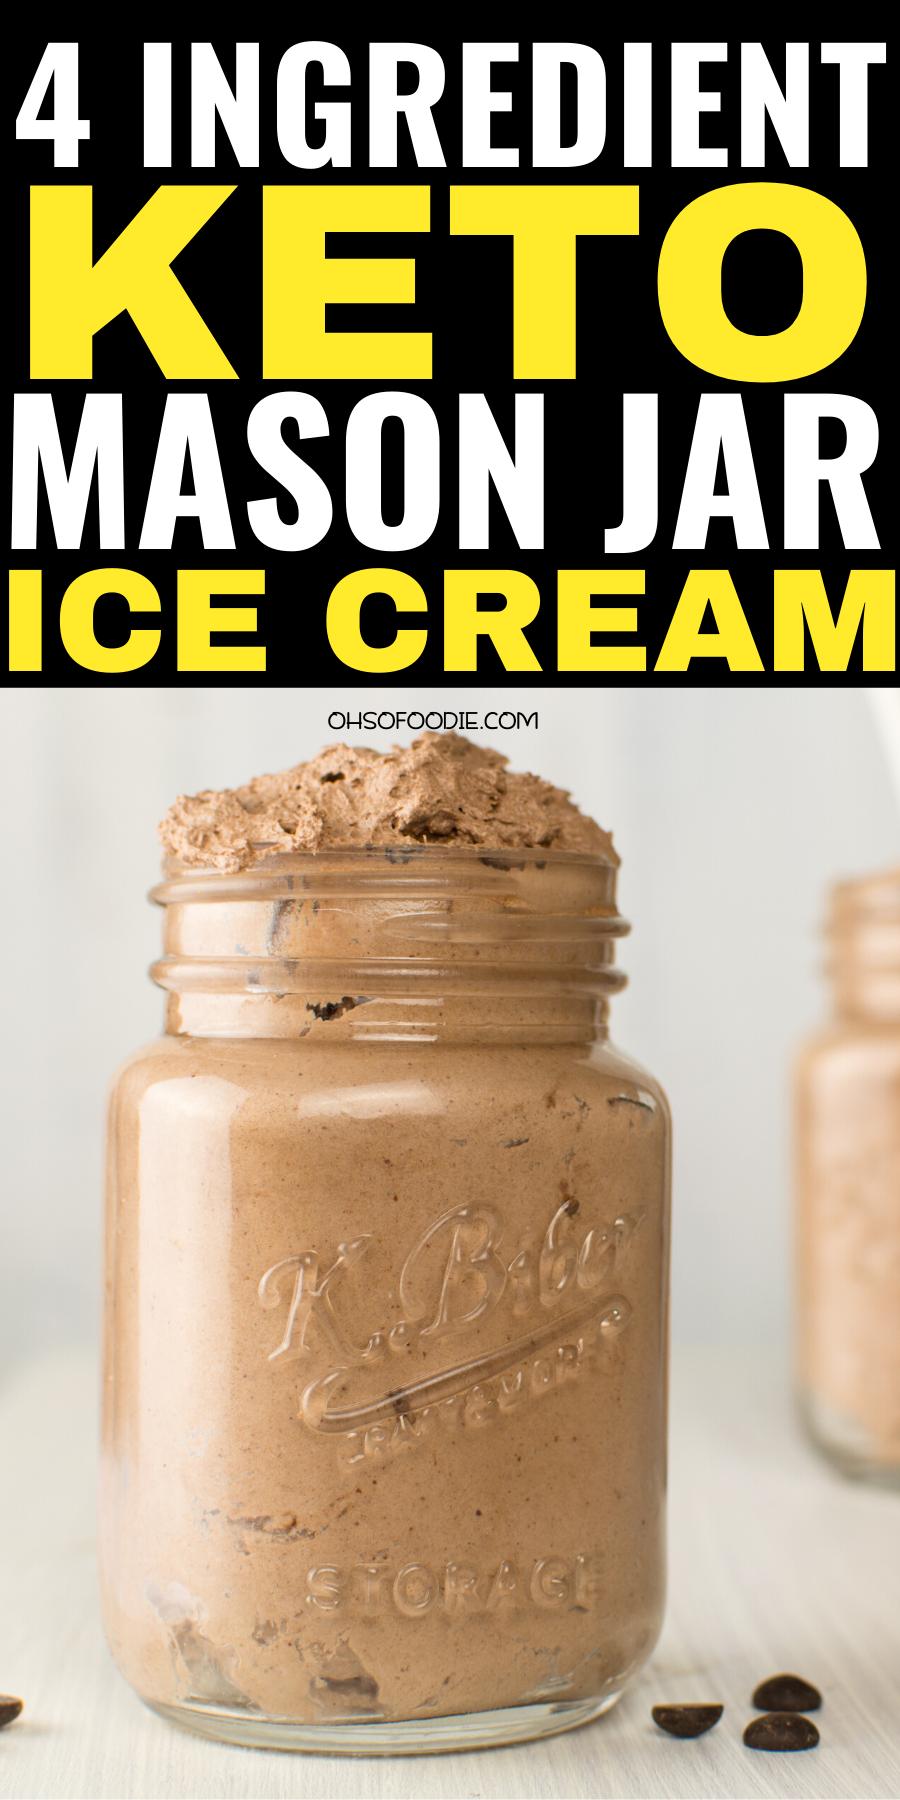 4 Ingredient Keto Mason Jar Ice Cream